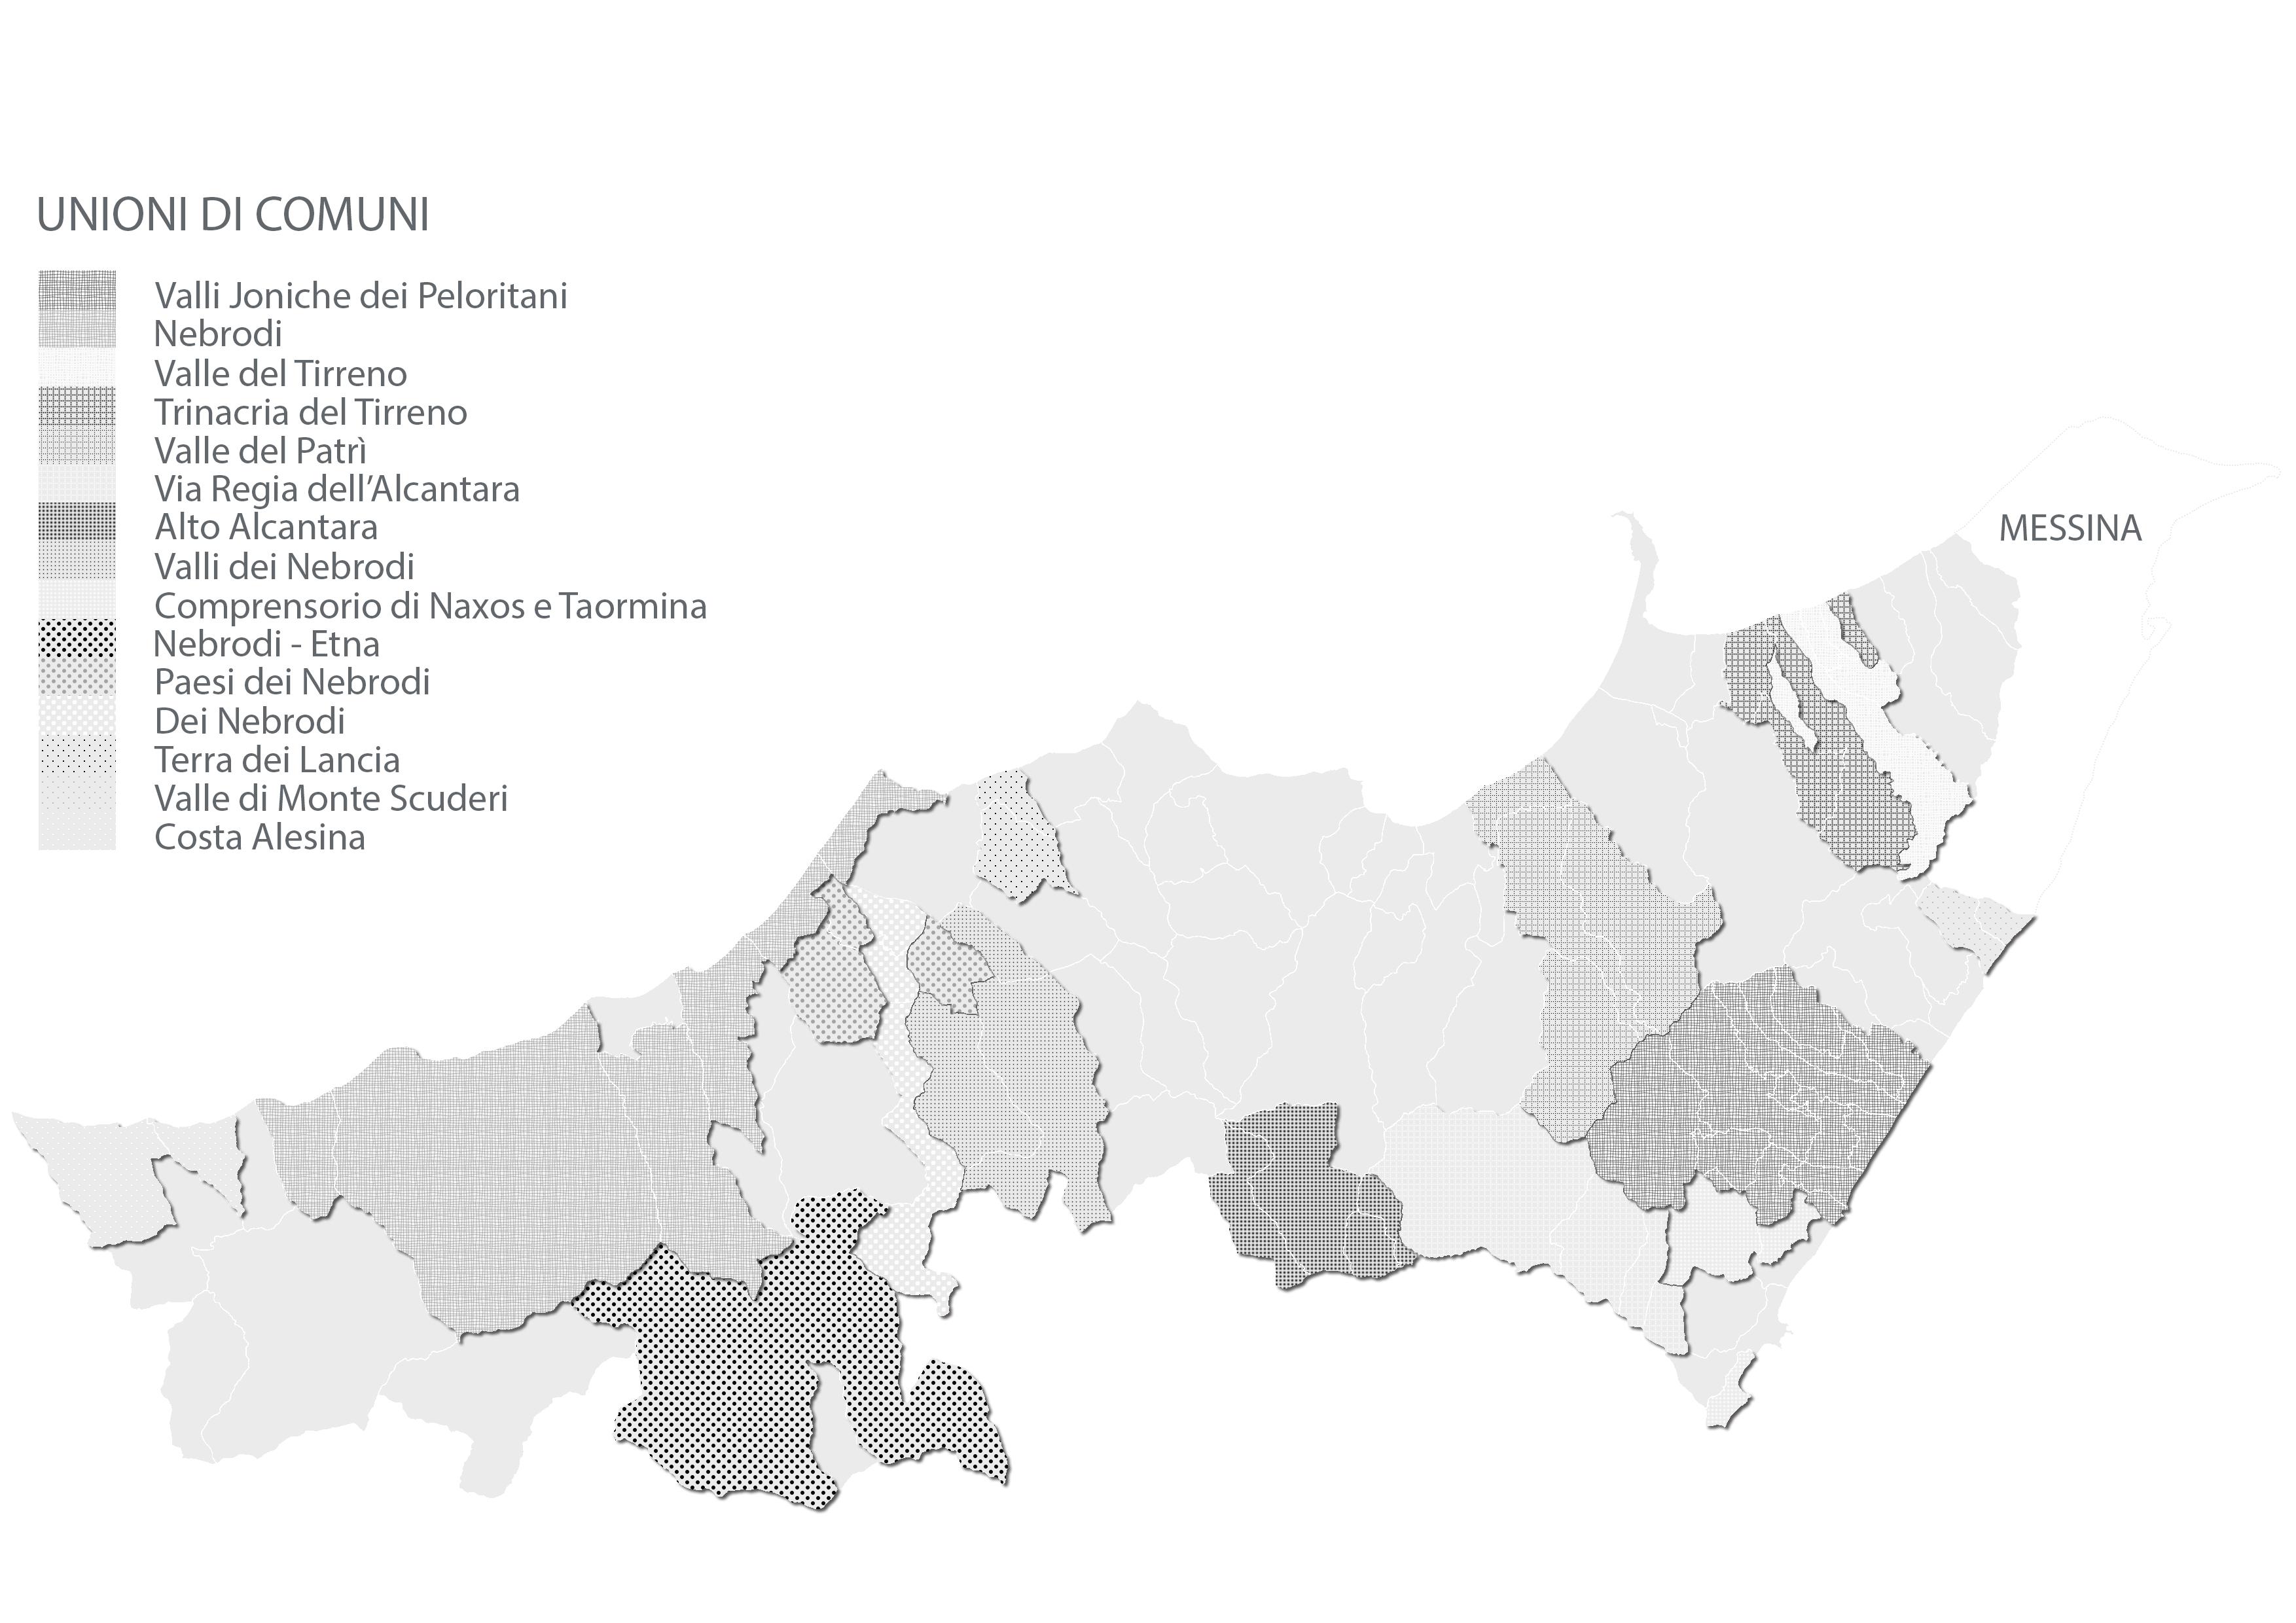 Città Metropolitana di Messina - Unioni di Comuni